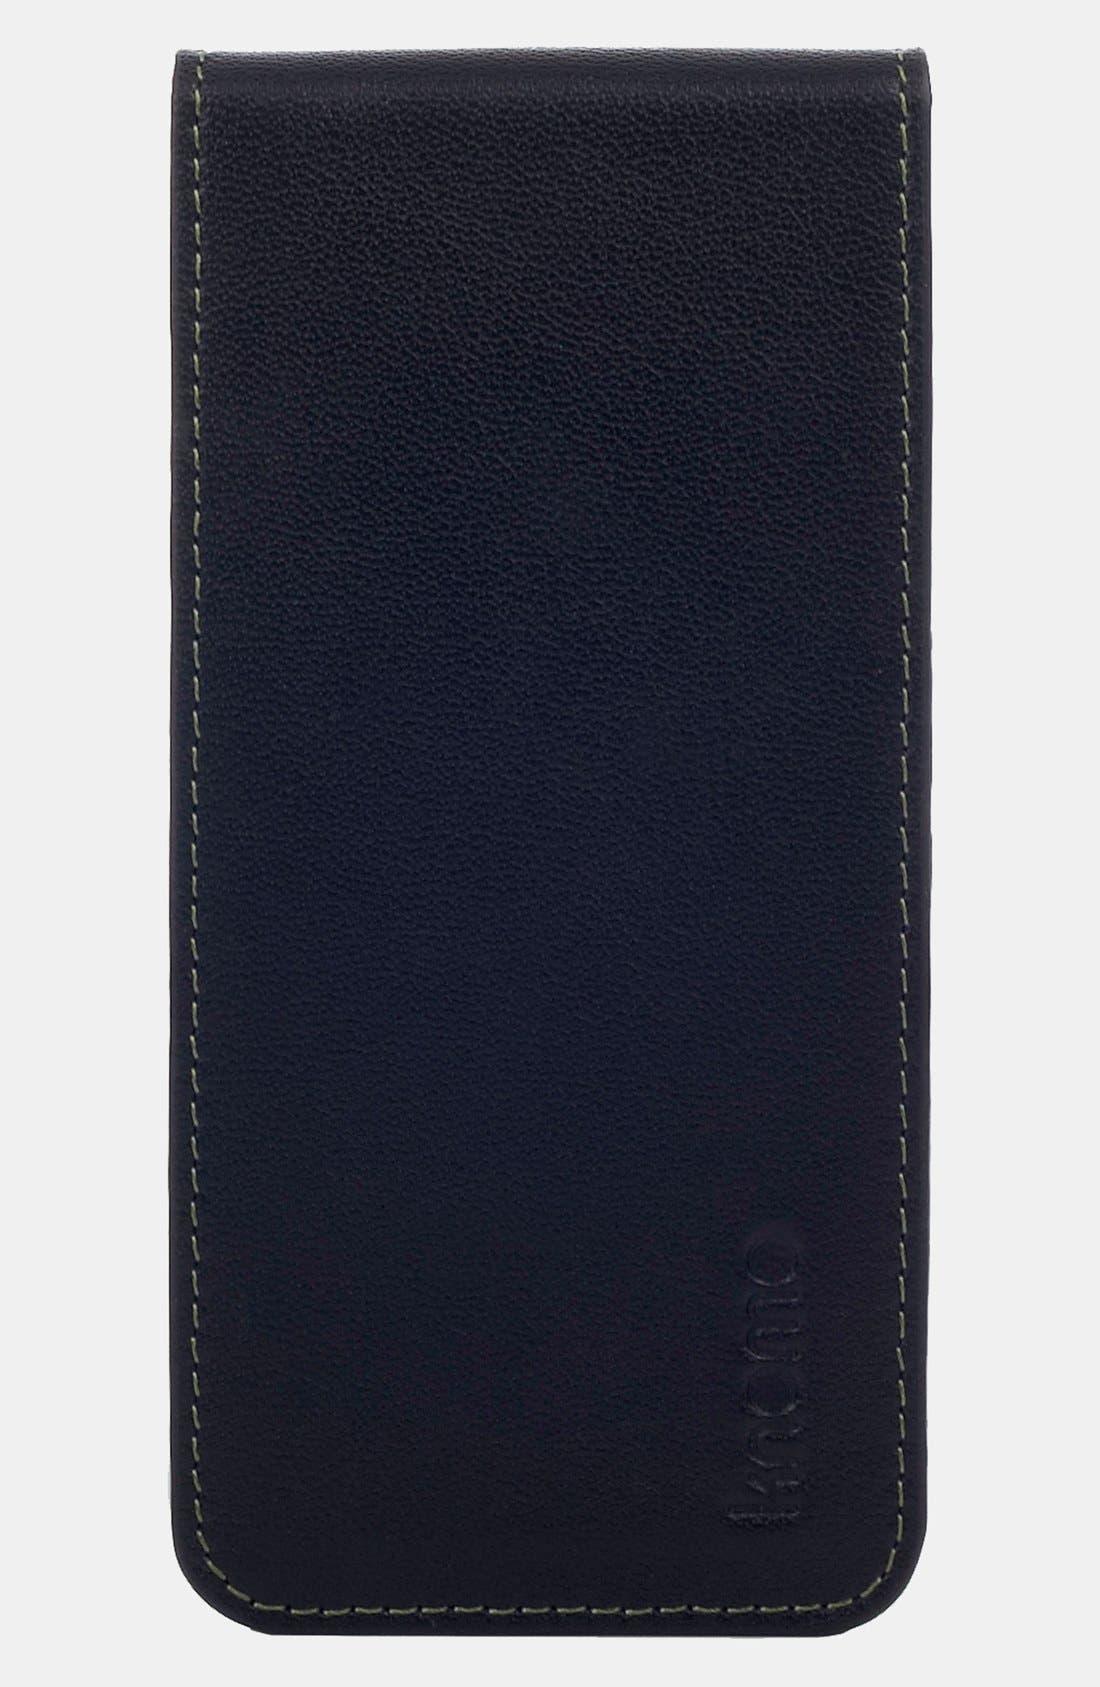 Alternate Image 1 Selected - KNOMO London iPhone 5 Flip Case